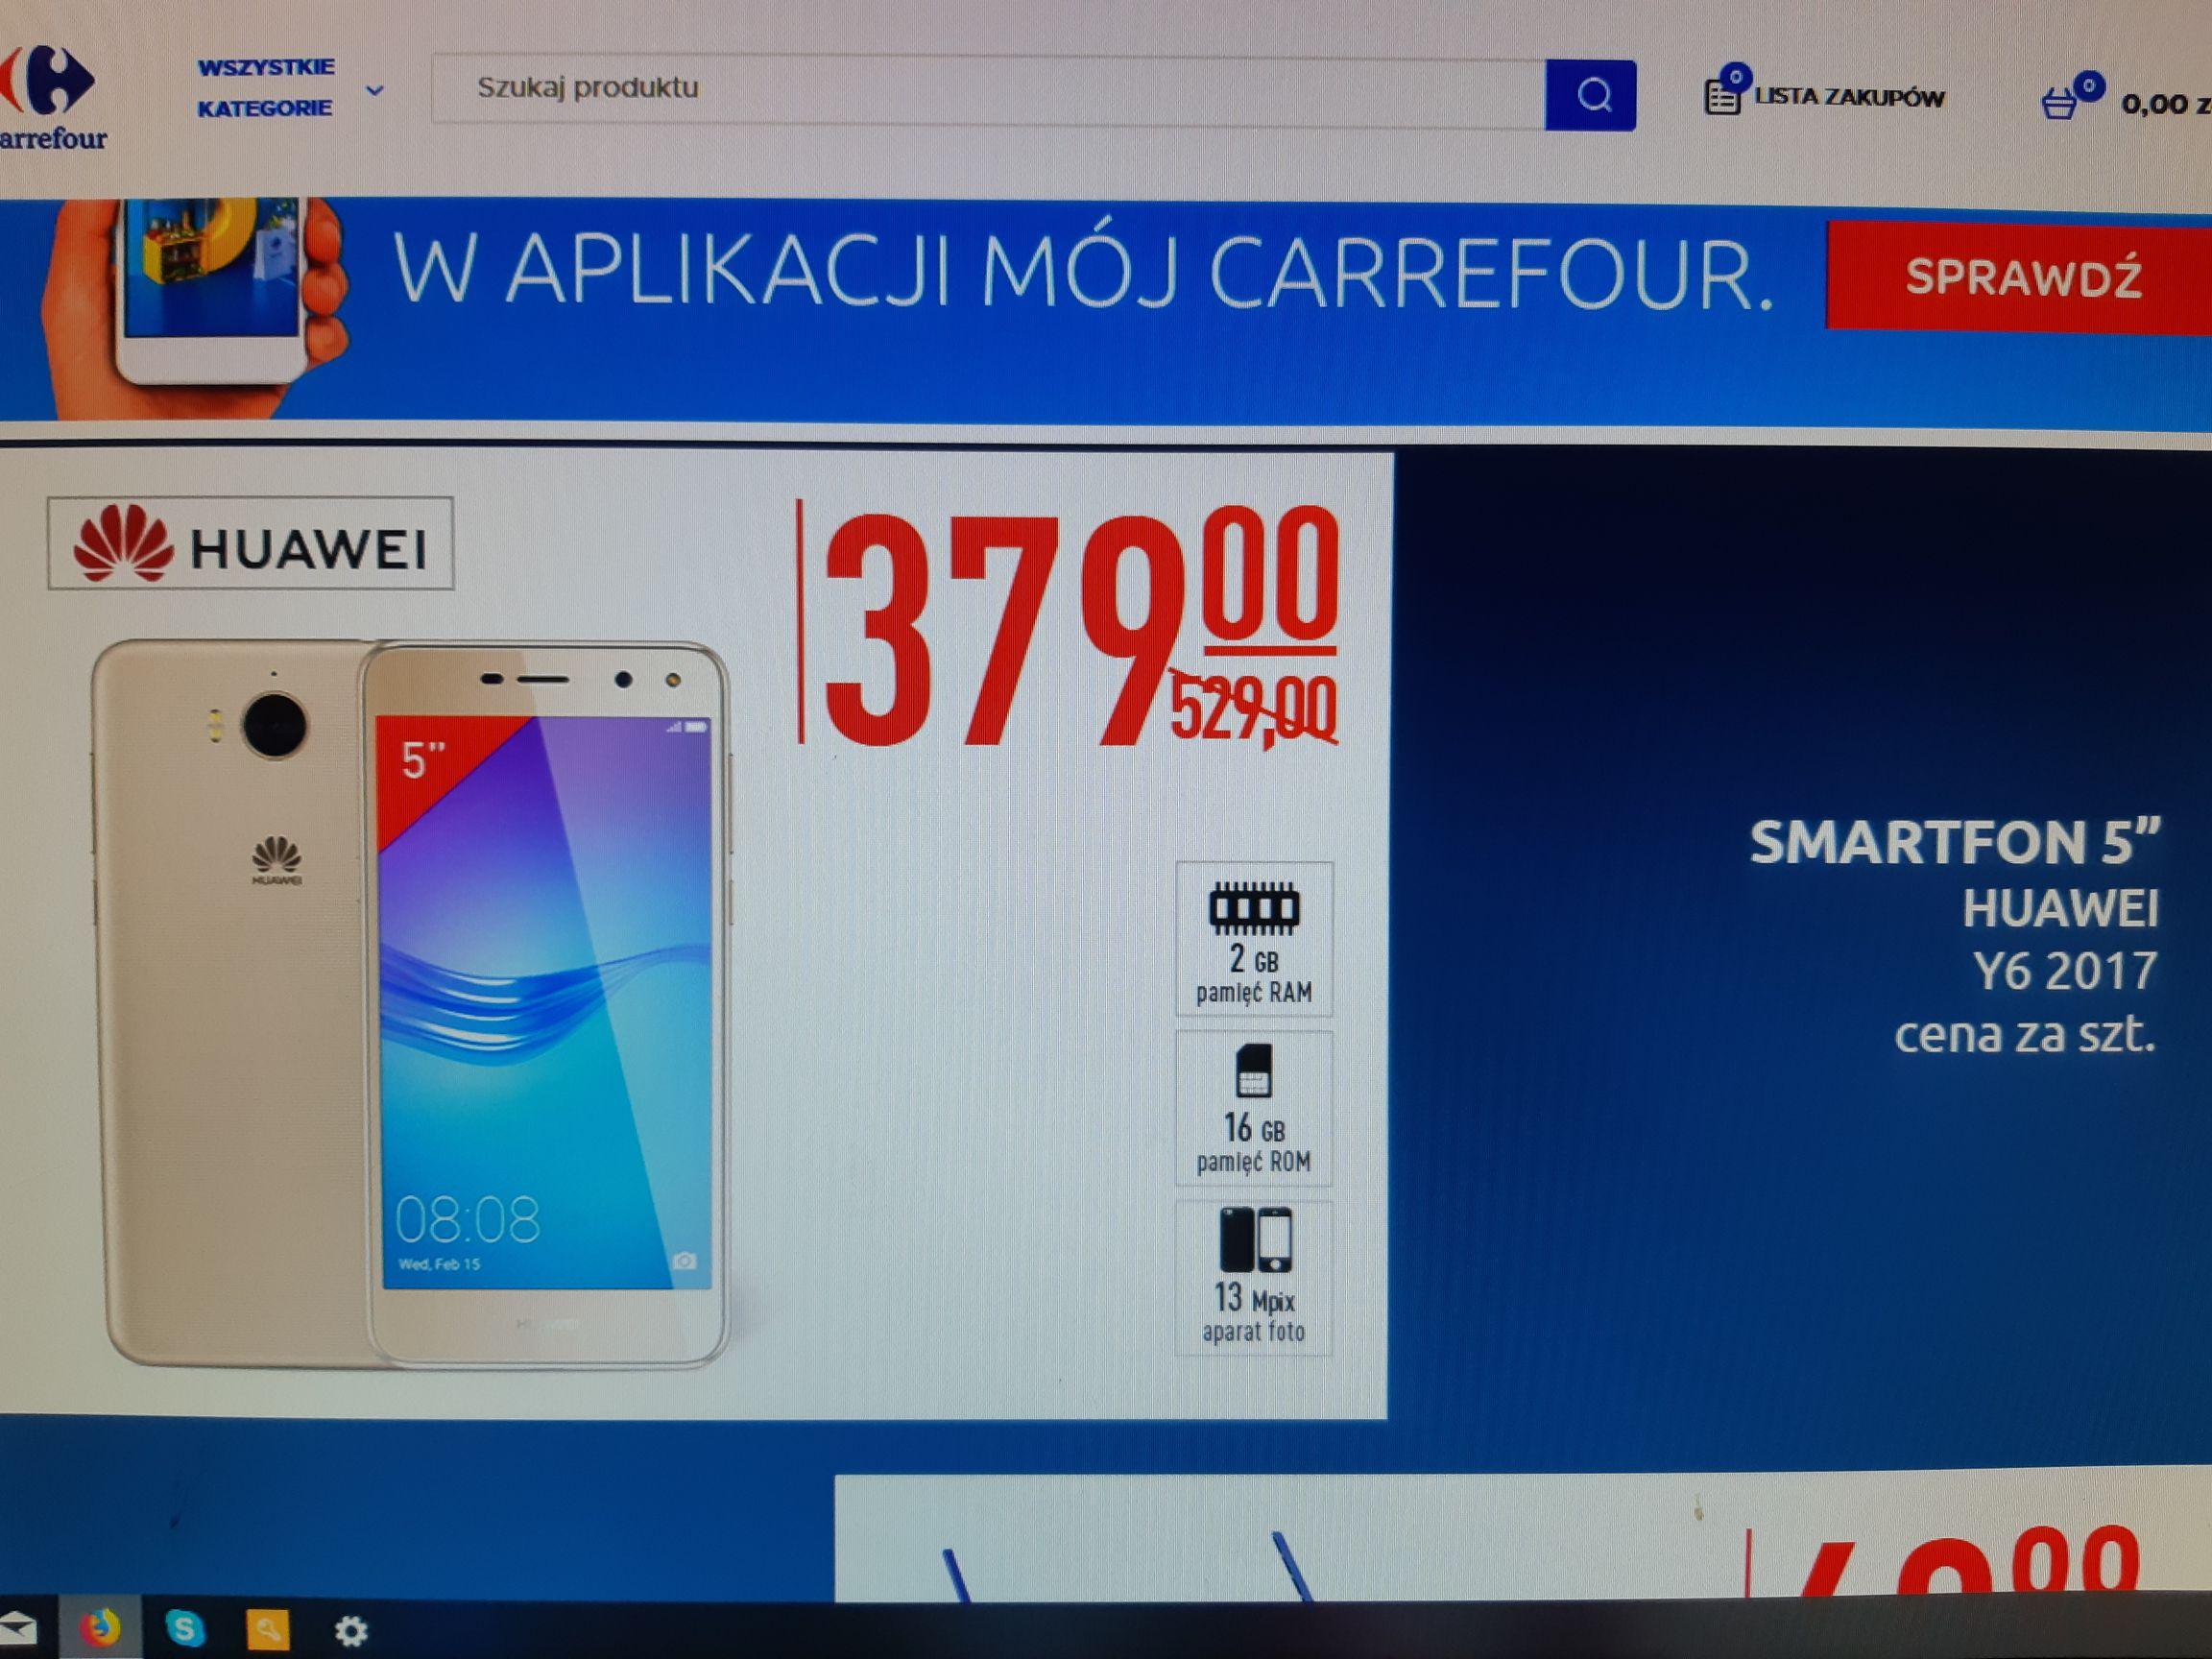 Smartphone Huawei Y6 2017 #Carrefour